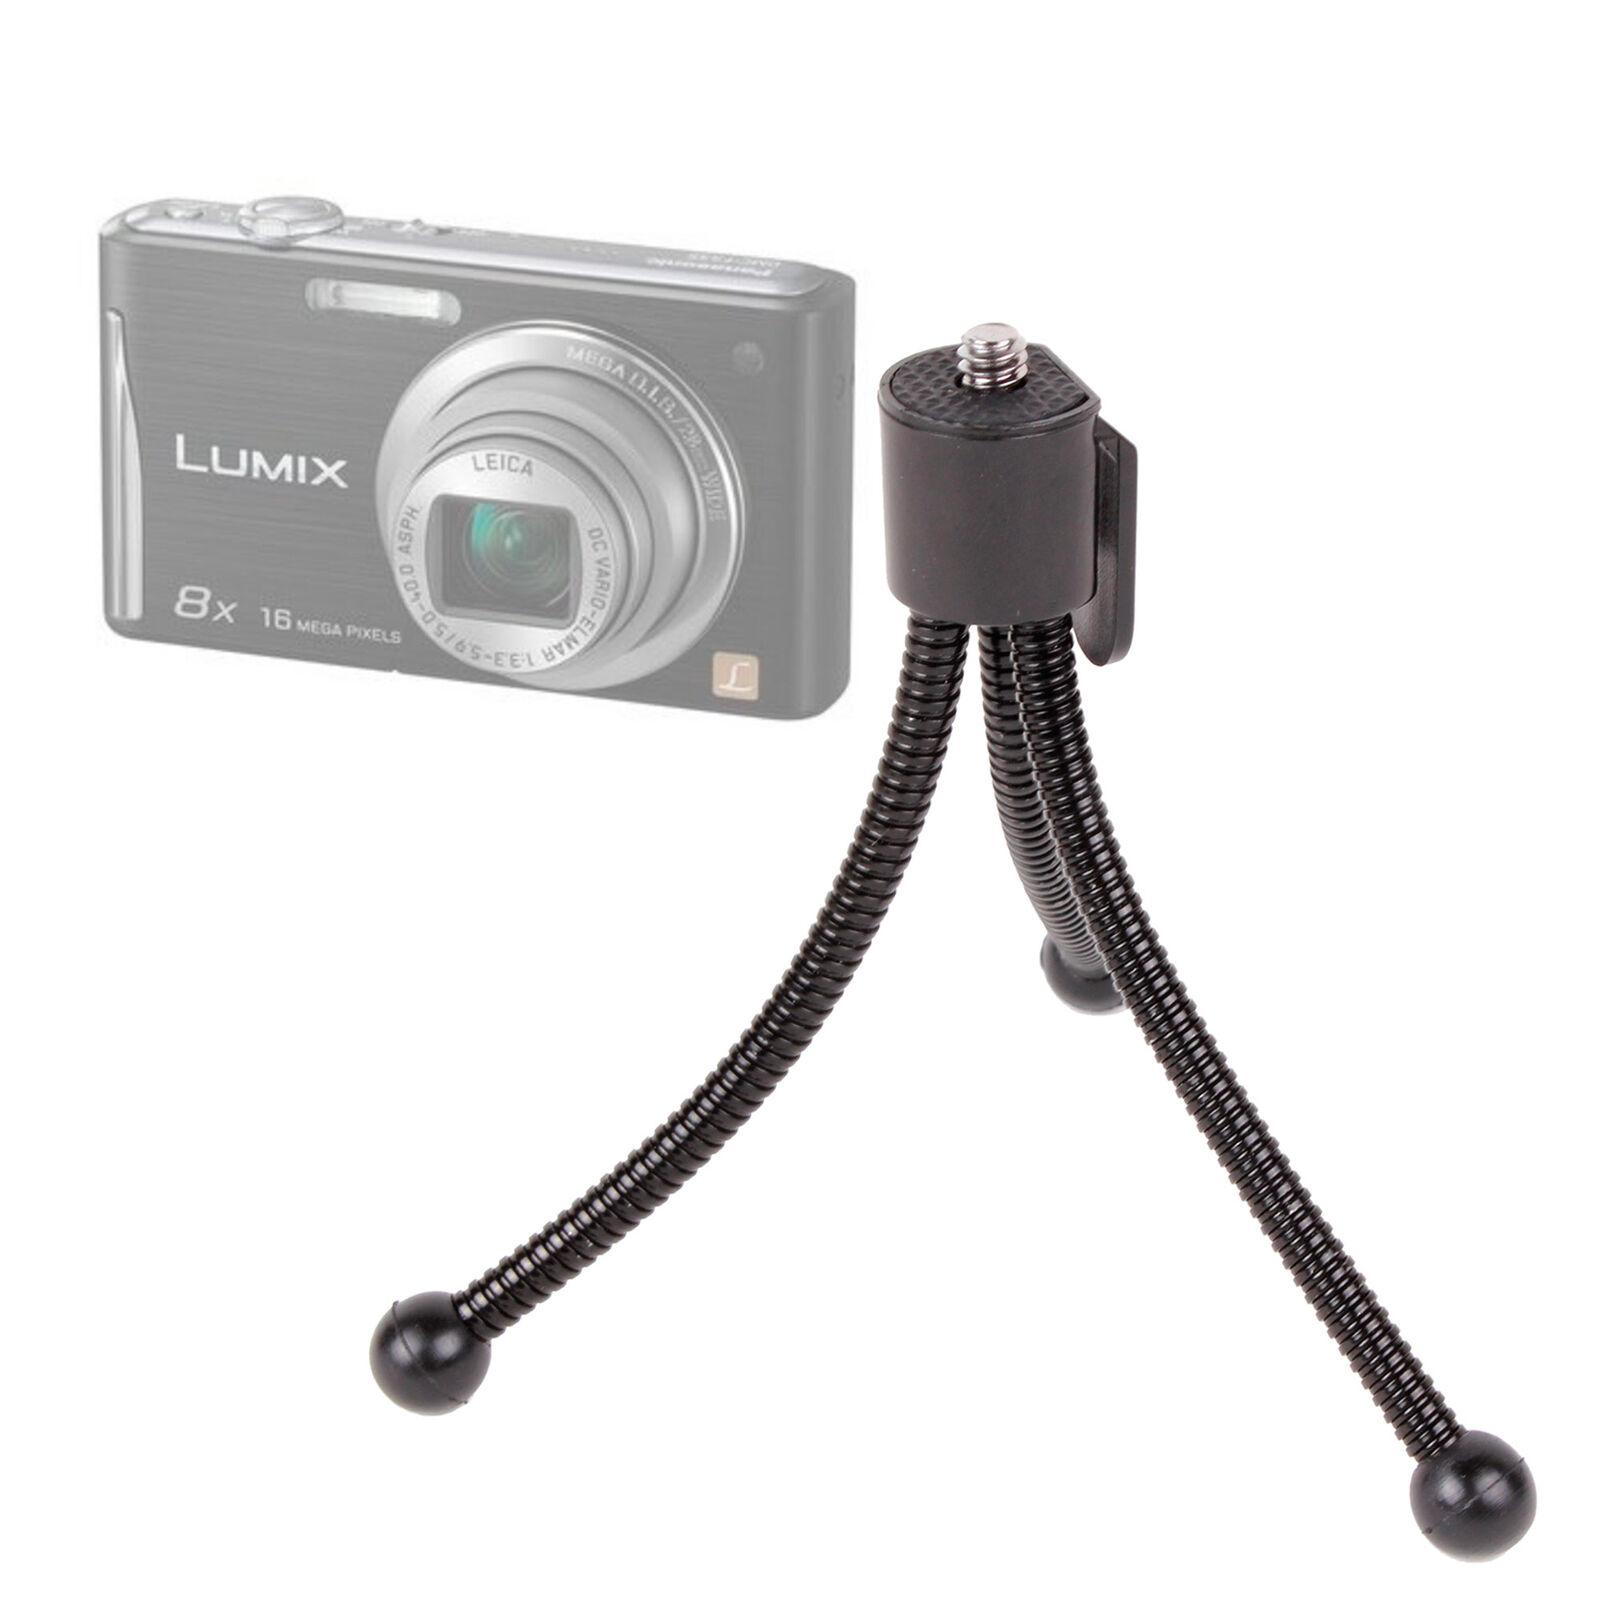 Lumix LX5 Compatible with Panasonic Lumix DMC-FH10//FS50 Lumix TZ18 /& DMC-TZ30EB-K DURAGADGET 2-in-1 Extendable Travel Tripod Lumix DMC-FS35